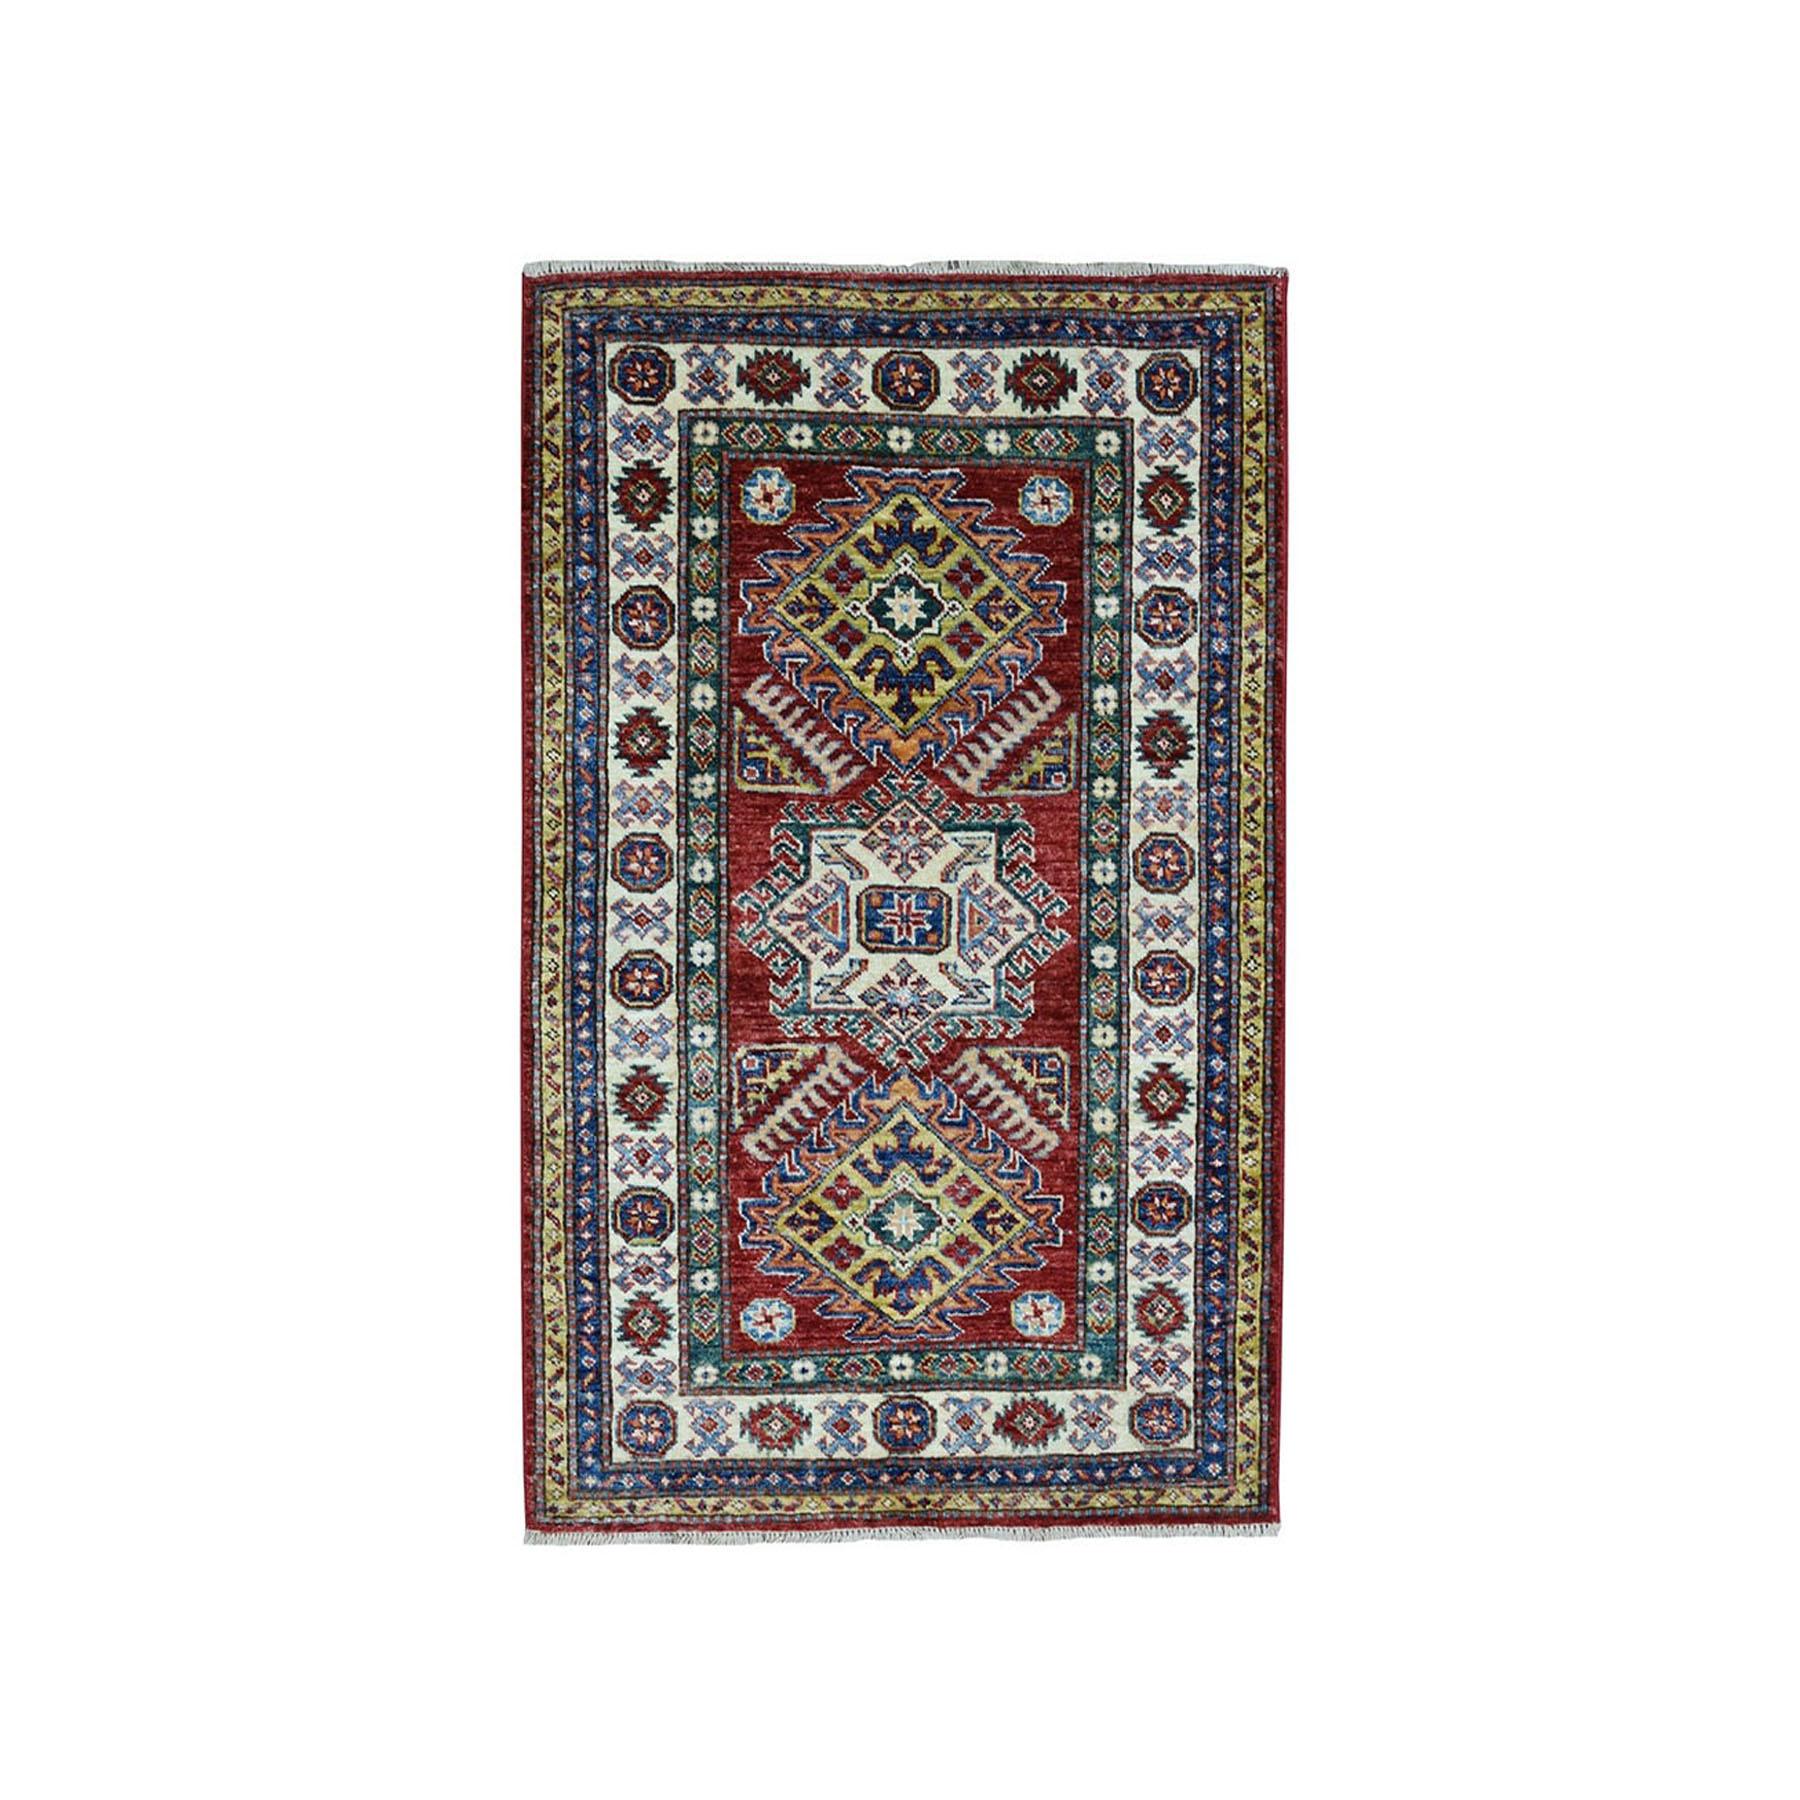 3'X4' Red Super Kazak Pure Wool Geometric Design Hand-Knotted Oriental Rug moaea080